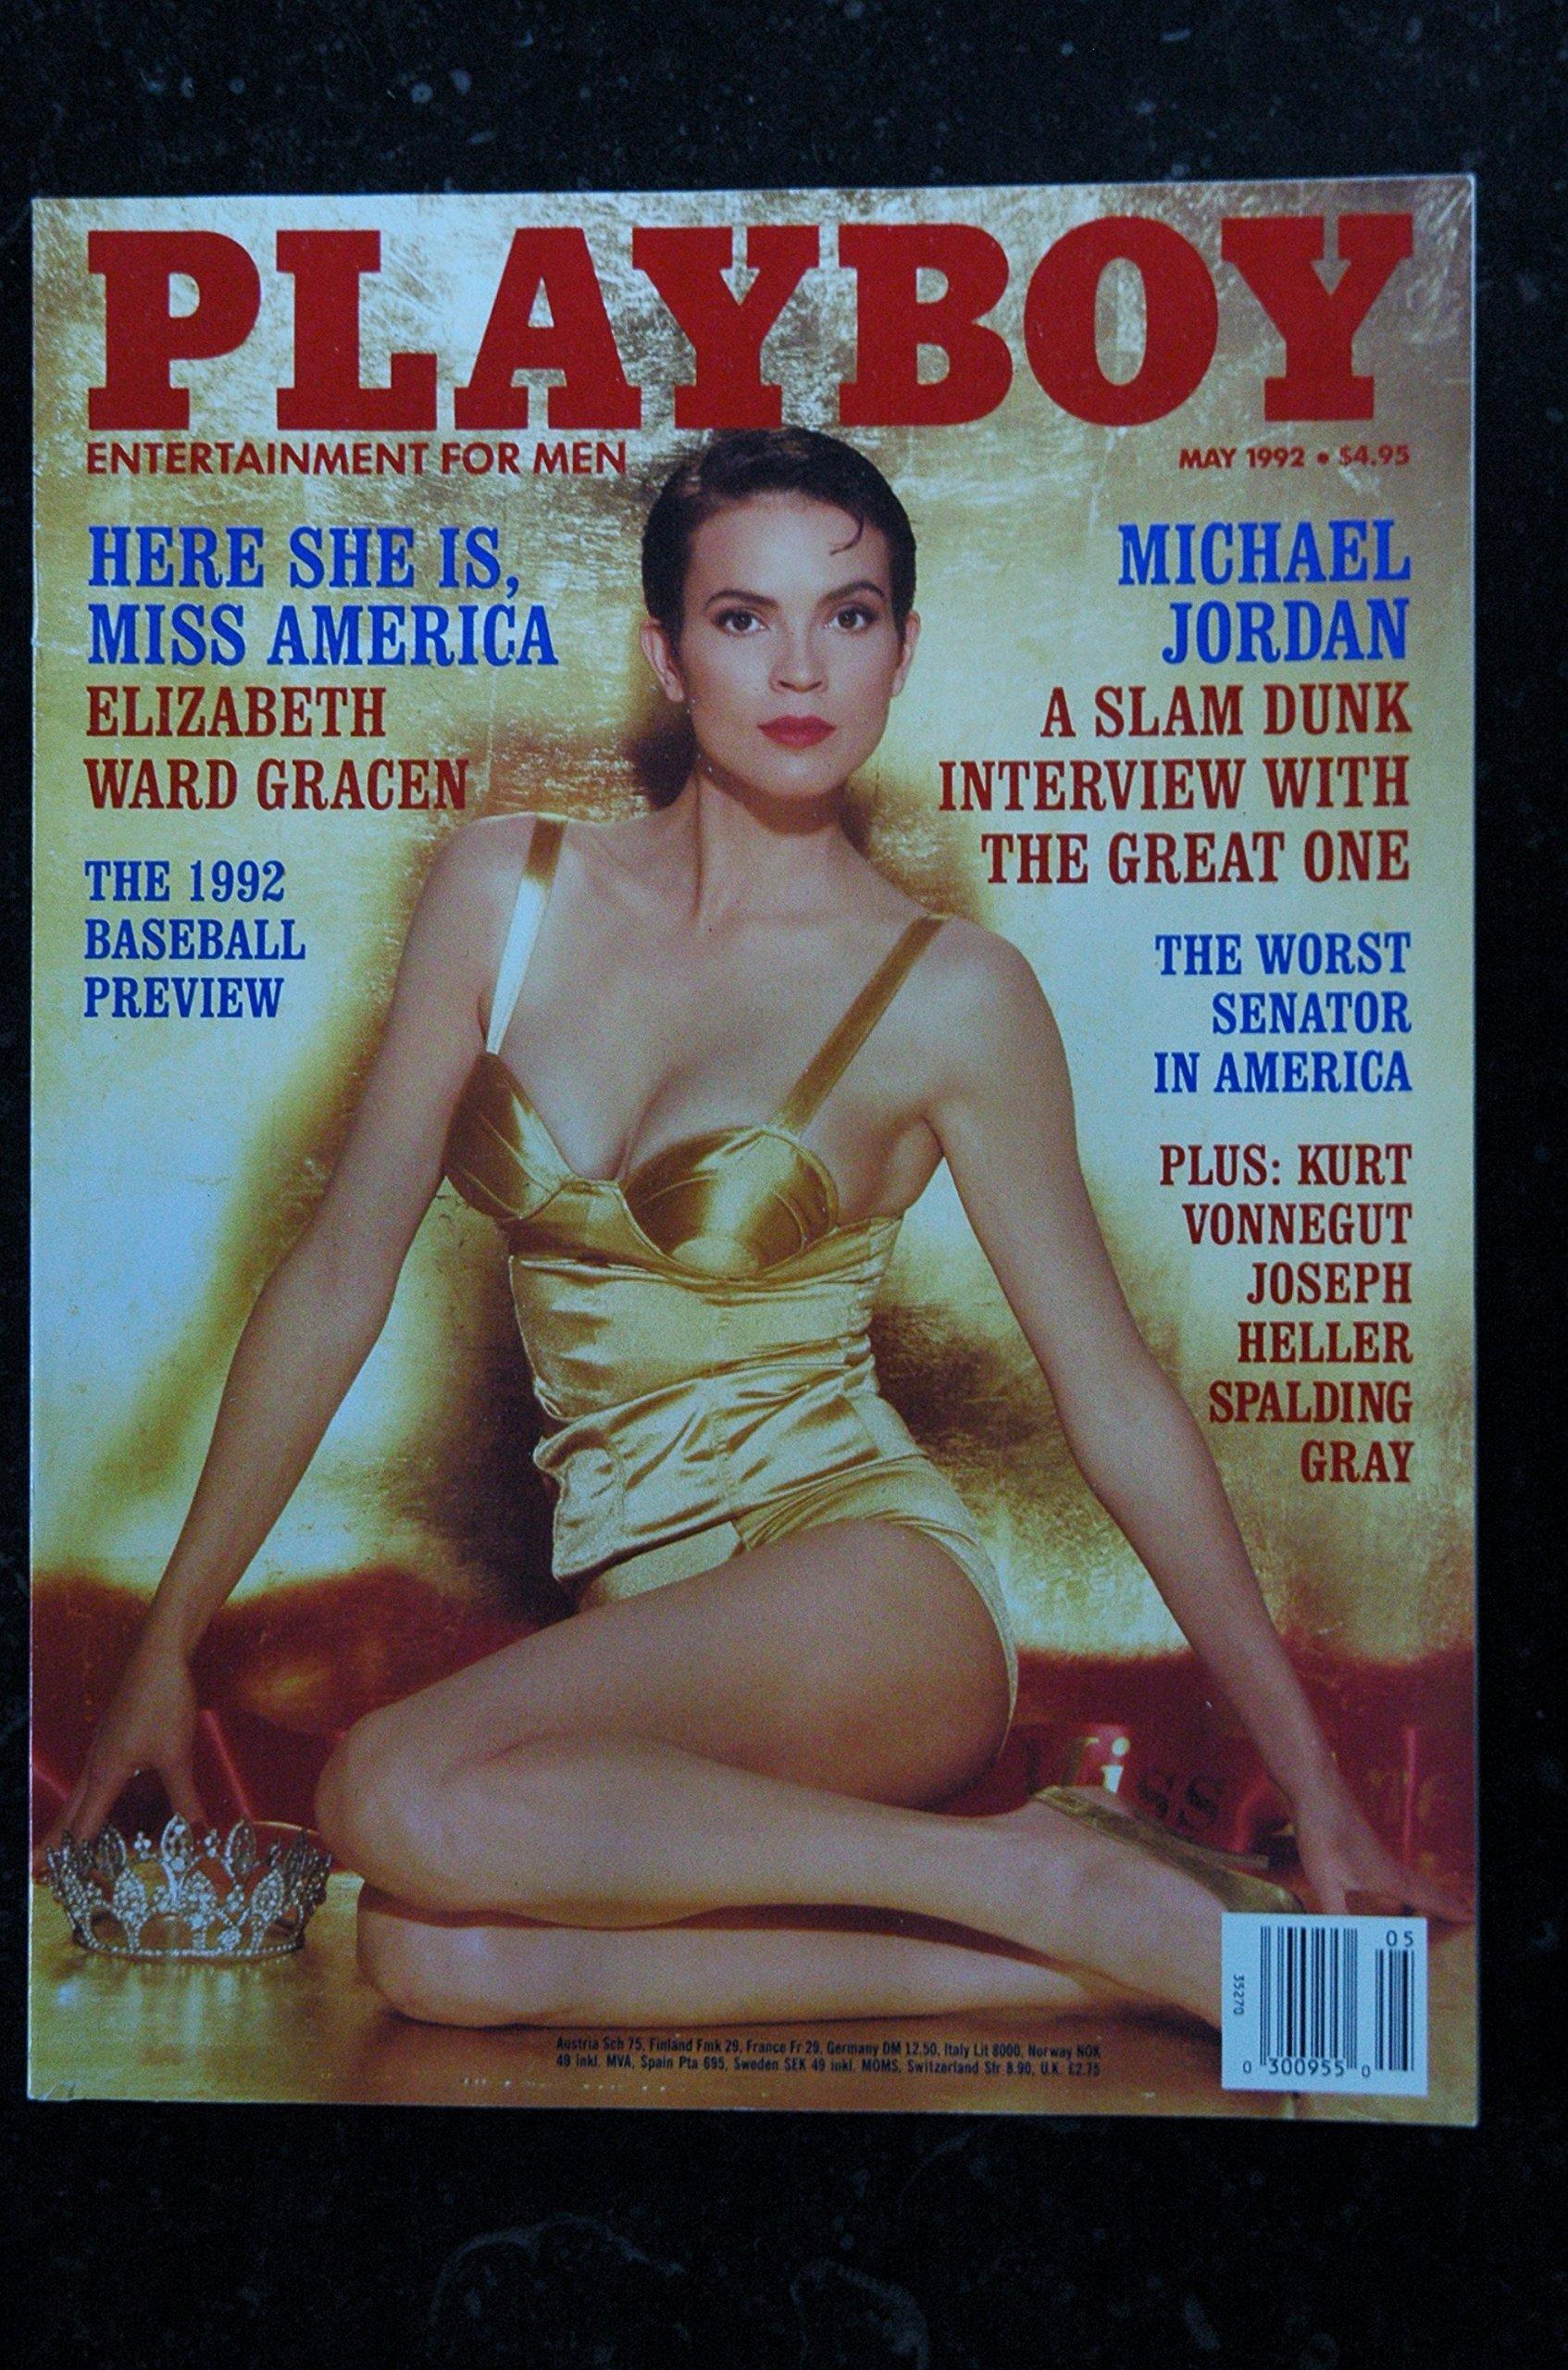 PLAYBOY US 1992 05 ELIZABETH WARD GRACEN MICHAEL JORDAN Anna Nicole Smith  Michael Jordan: Les Trésors d Emmanuelle: 3701136721117: Amazon.com: Books